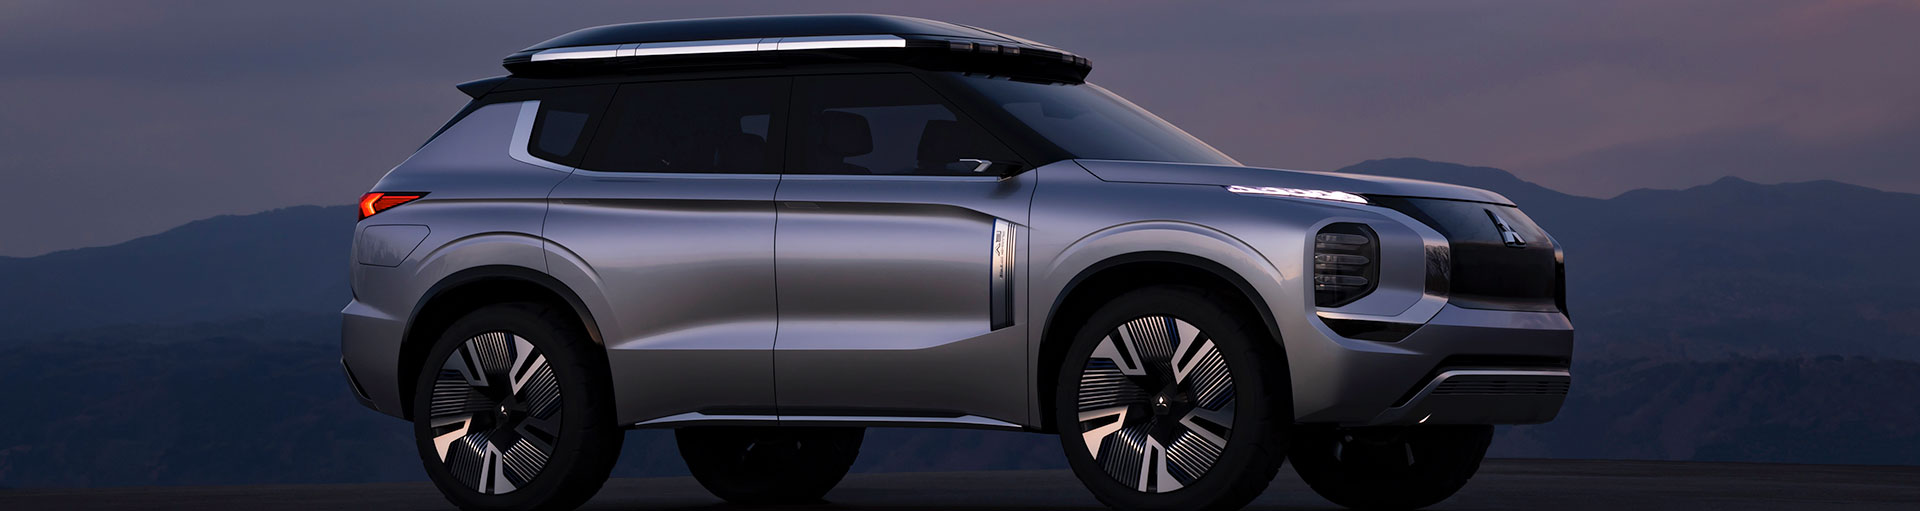 Brooklyn Mitsubishi 2019 Header